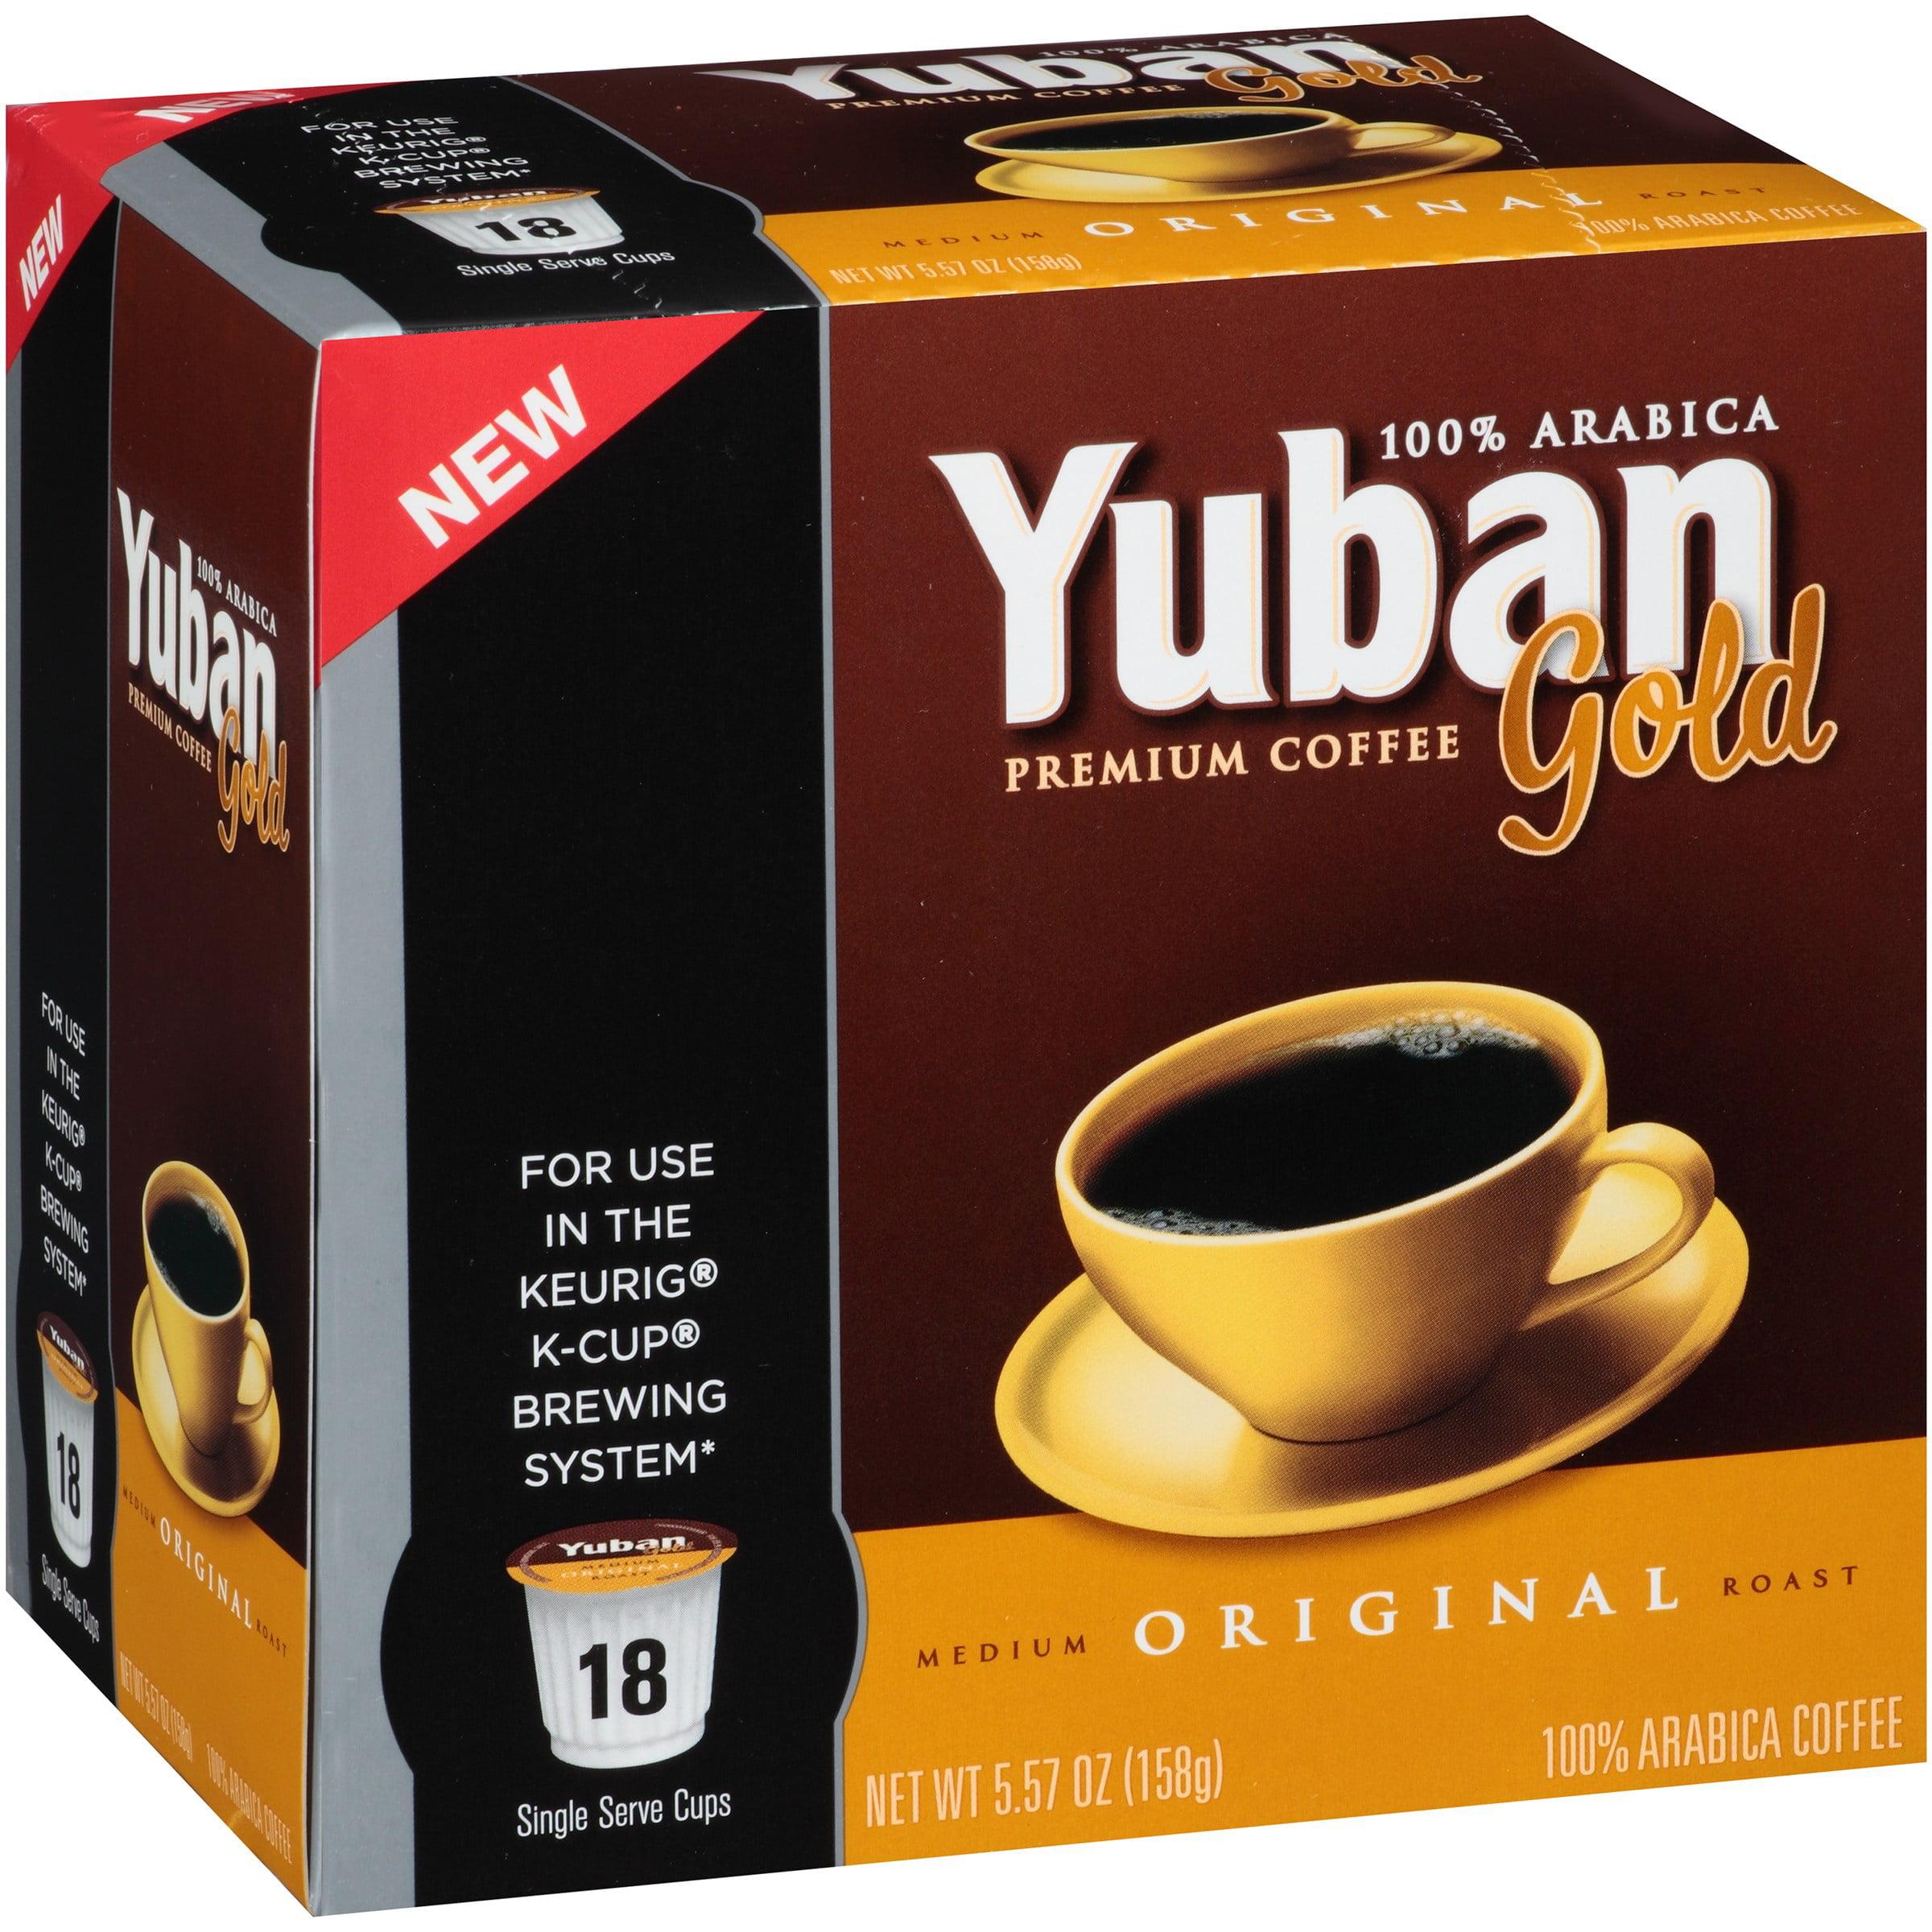 Yuban Gold Premium Medium Original Roast Coffee K-Cup Pods, 5.57 OZ (158g) 4300005724